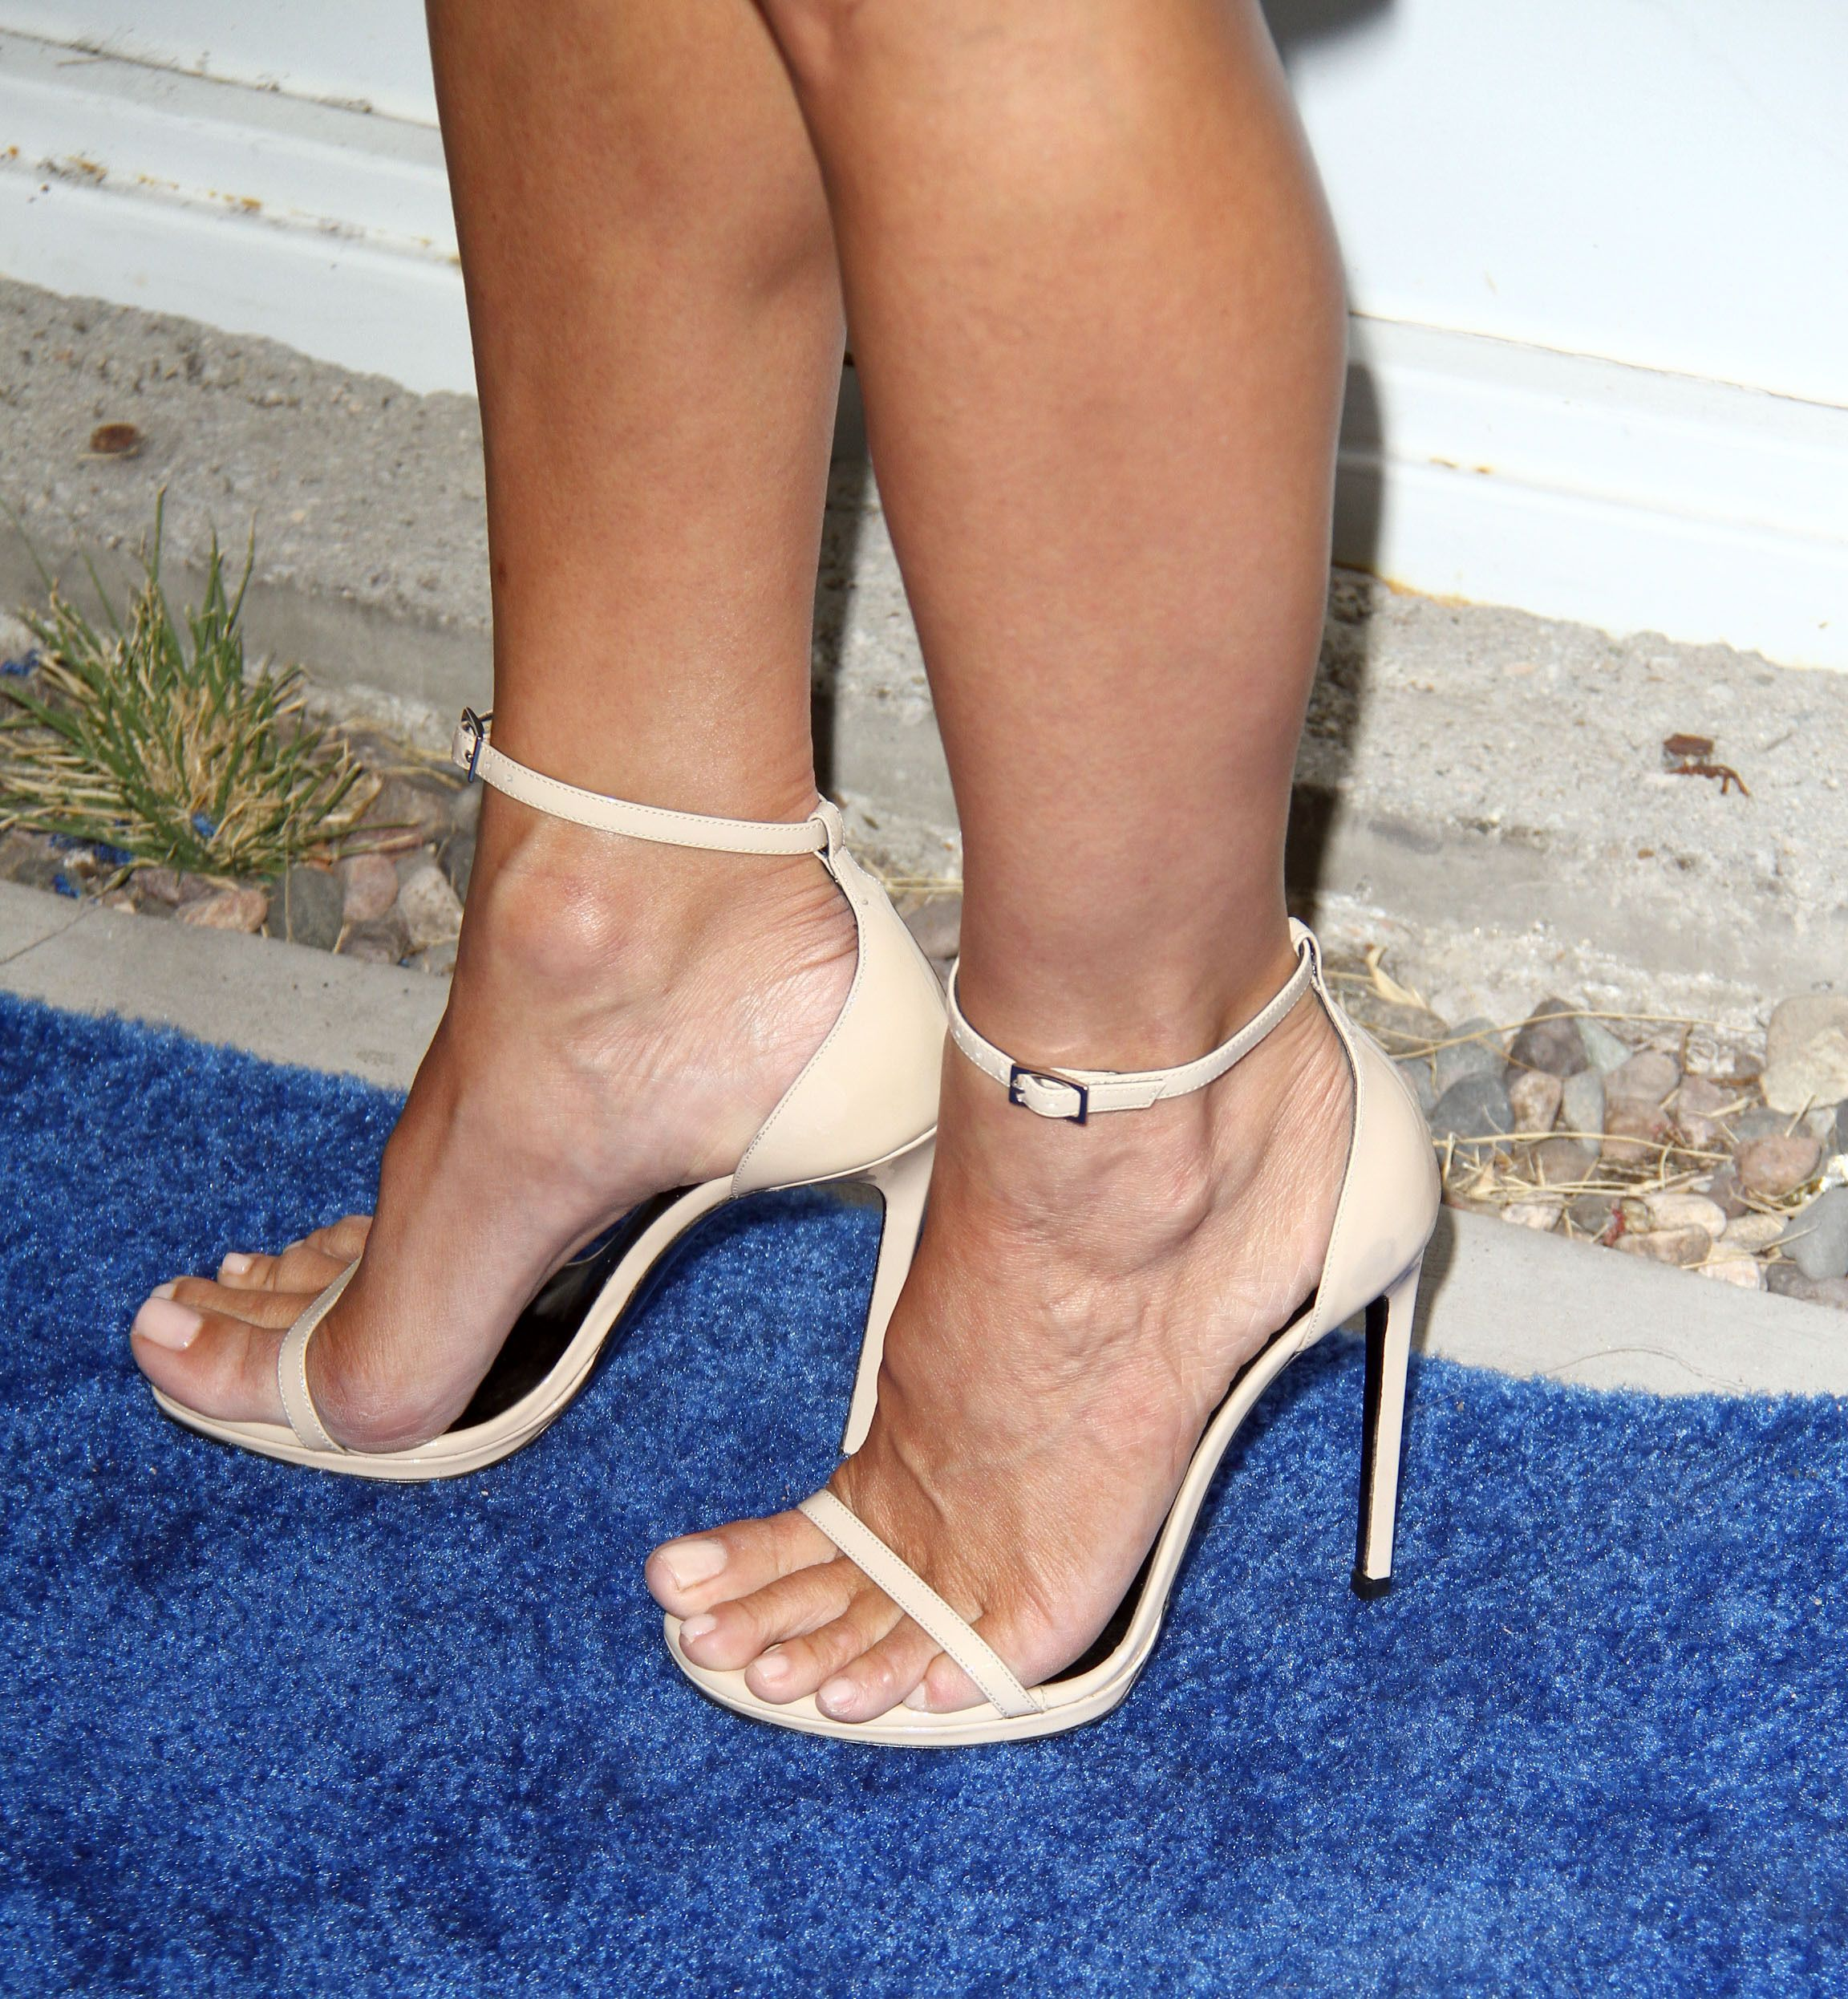 Pamela anderson feet fetish